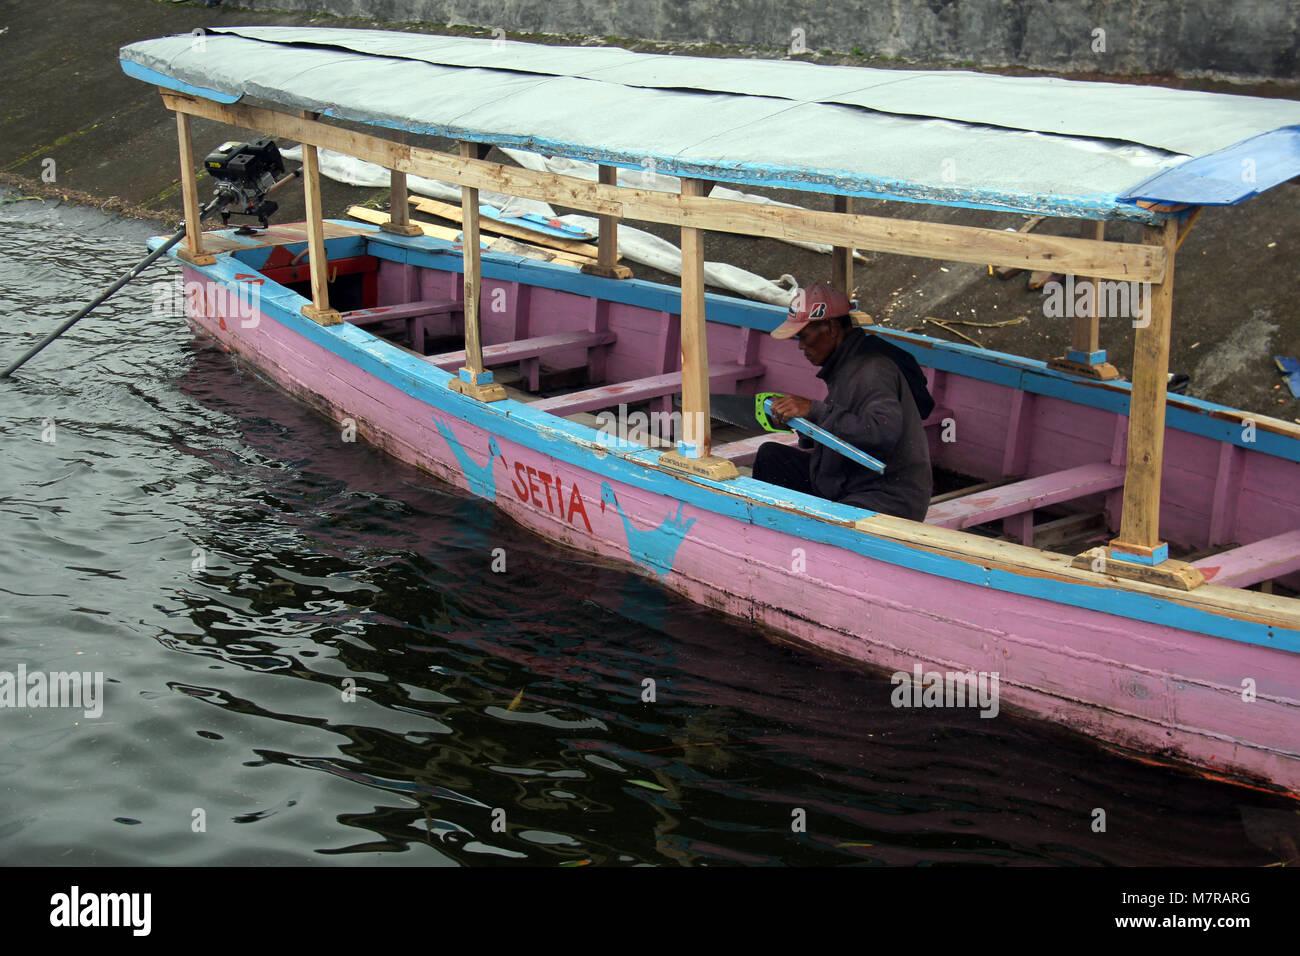 Repairing Wooden Boat Stockfotos & Repairing Wooden Boat Bilder - Alamy